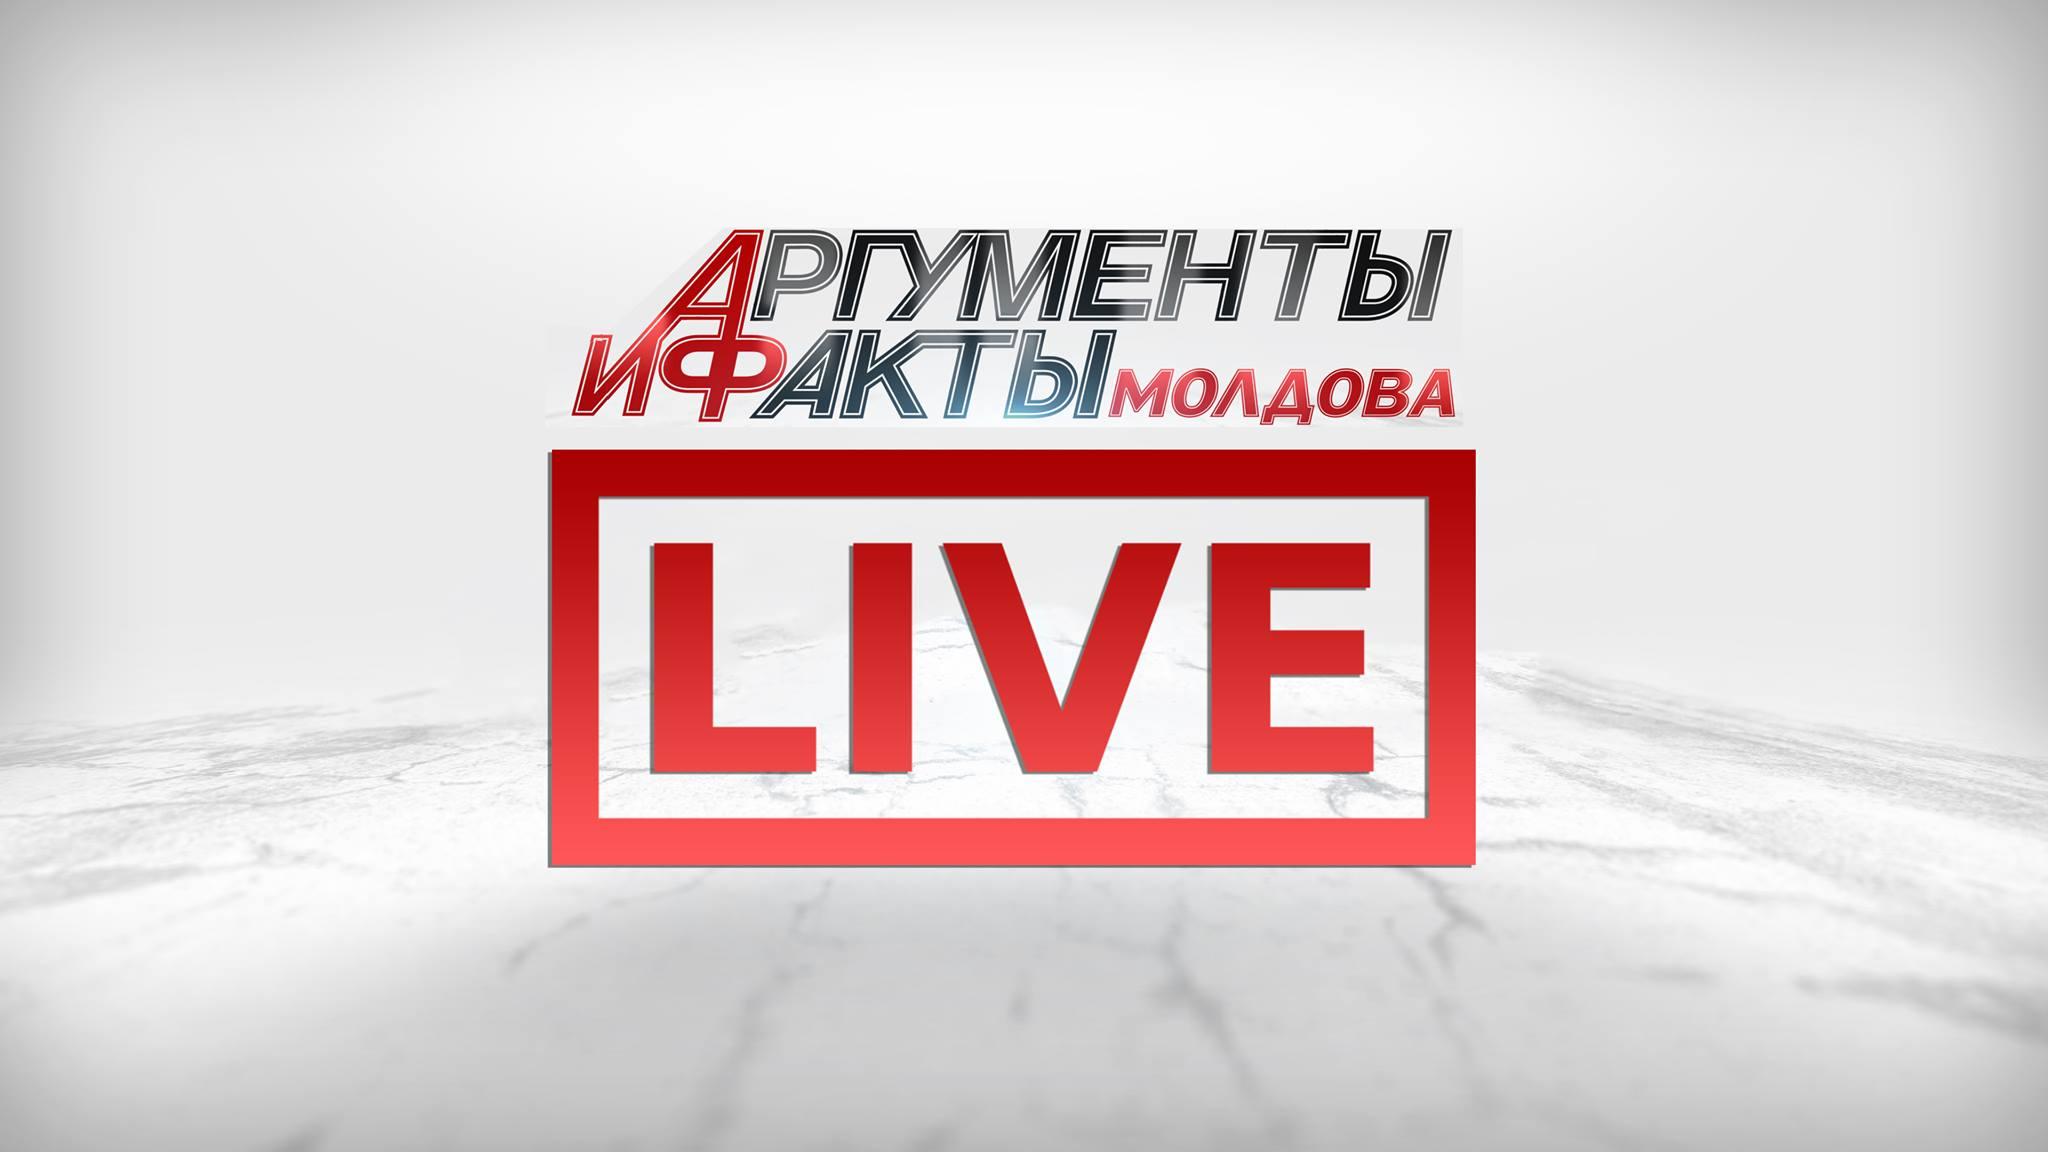 LIVE! В Бричанах проходит митинг протеста ПСРМ (ВИДЕО)